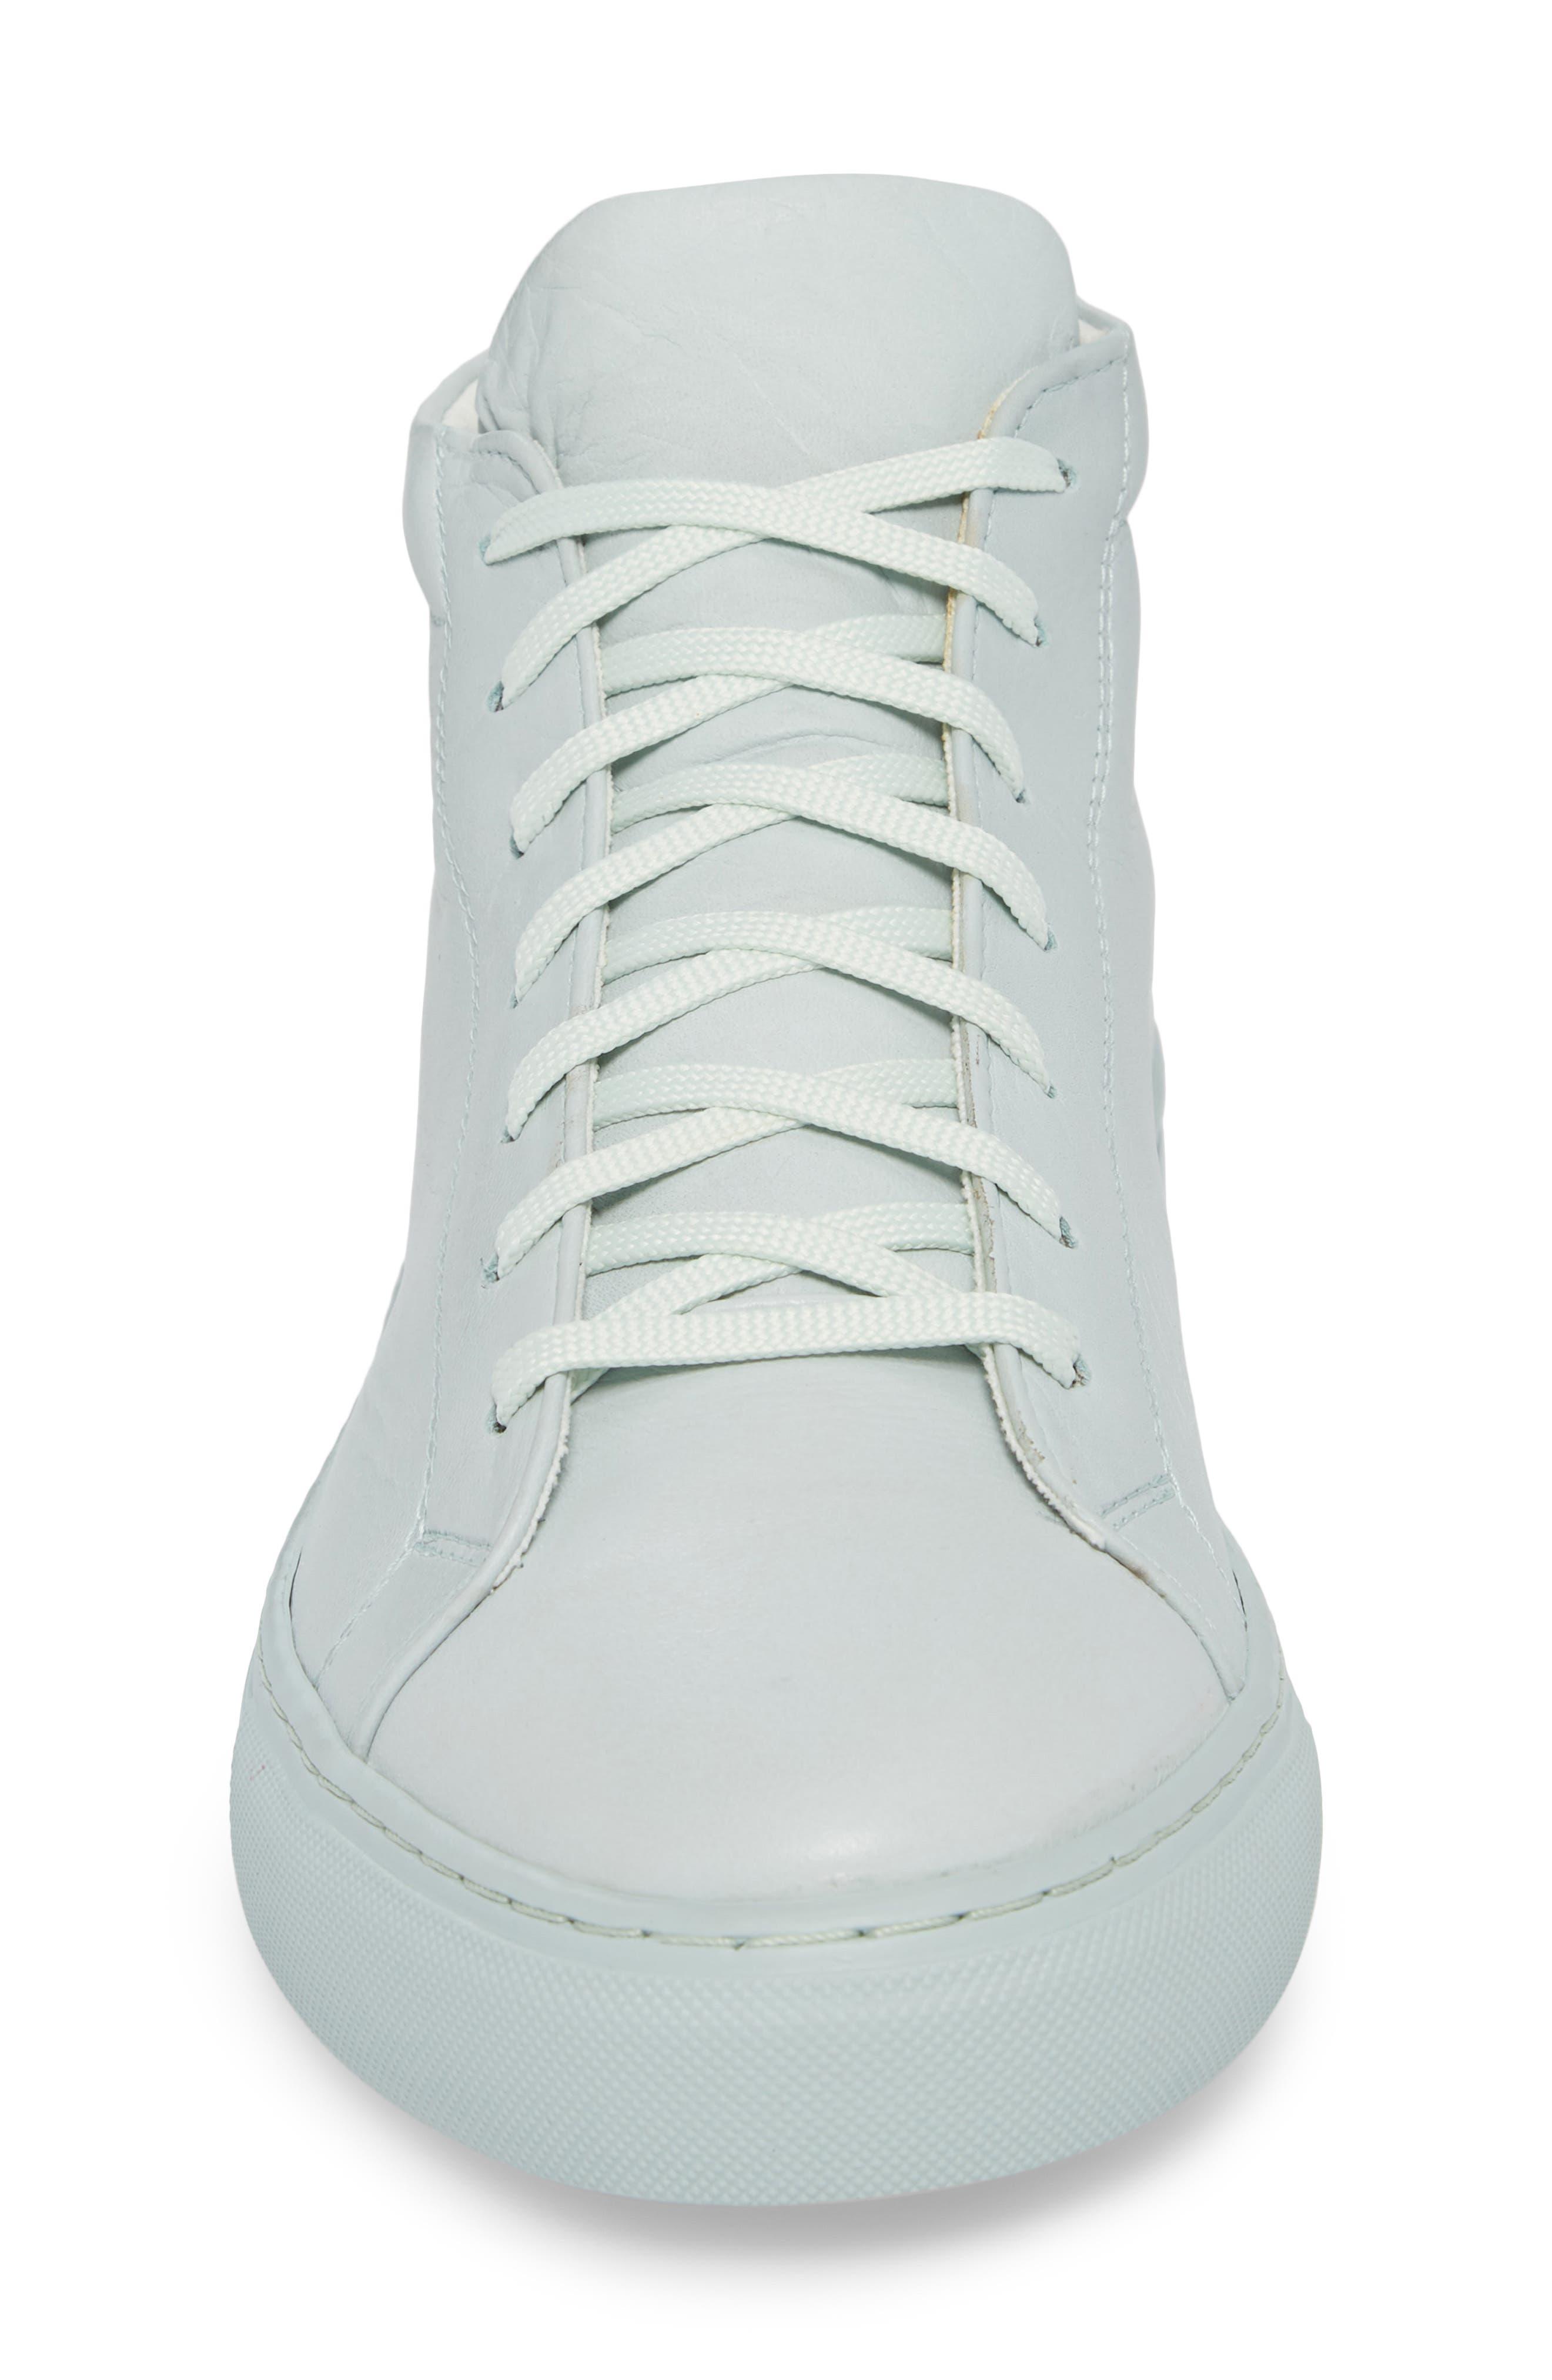 Lexington Mid Top Sneaker,                             Alternate thumbnail 4, color,                             303